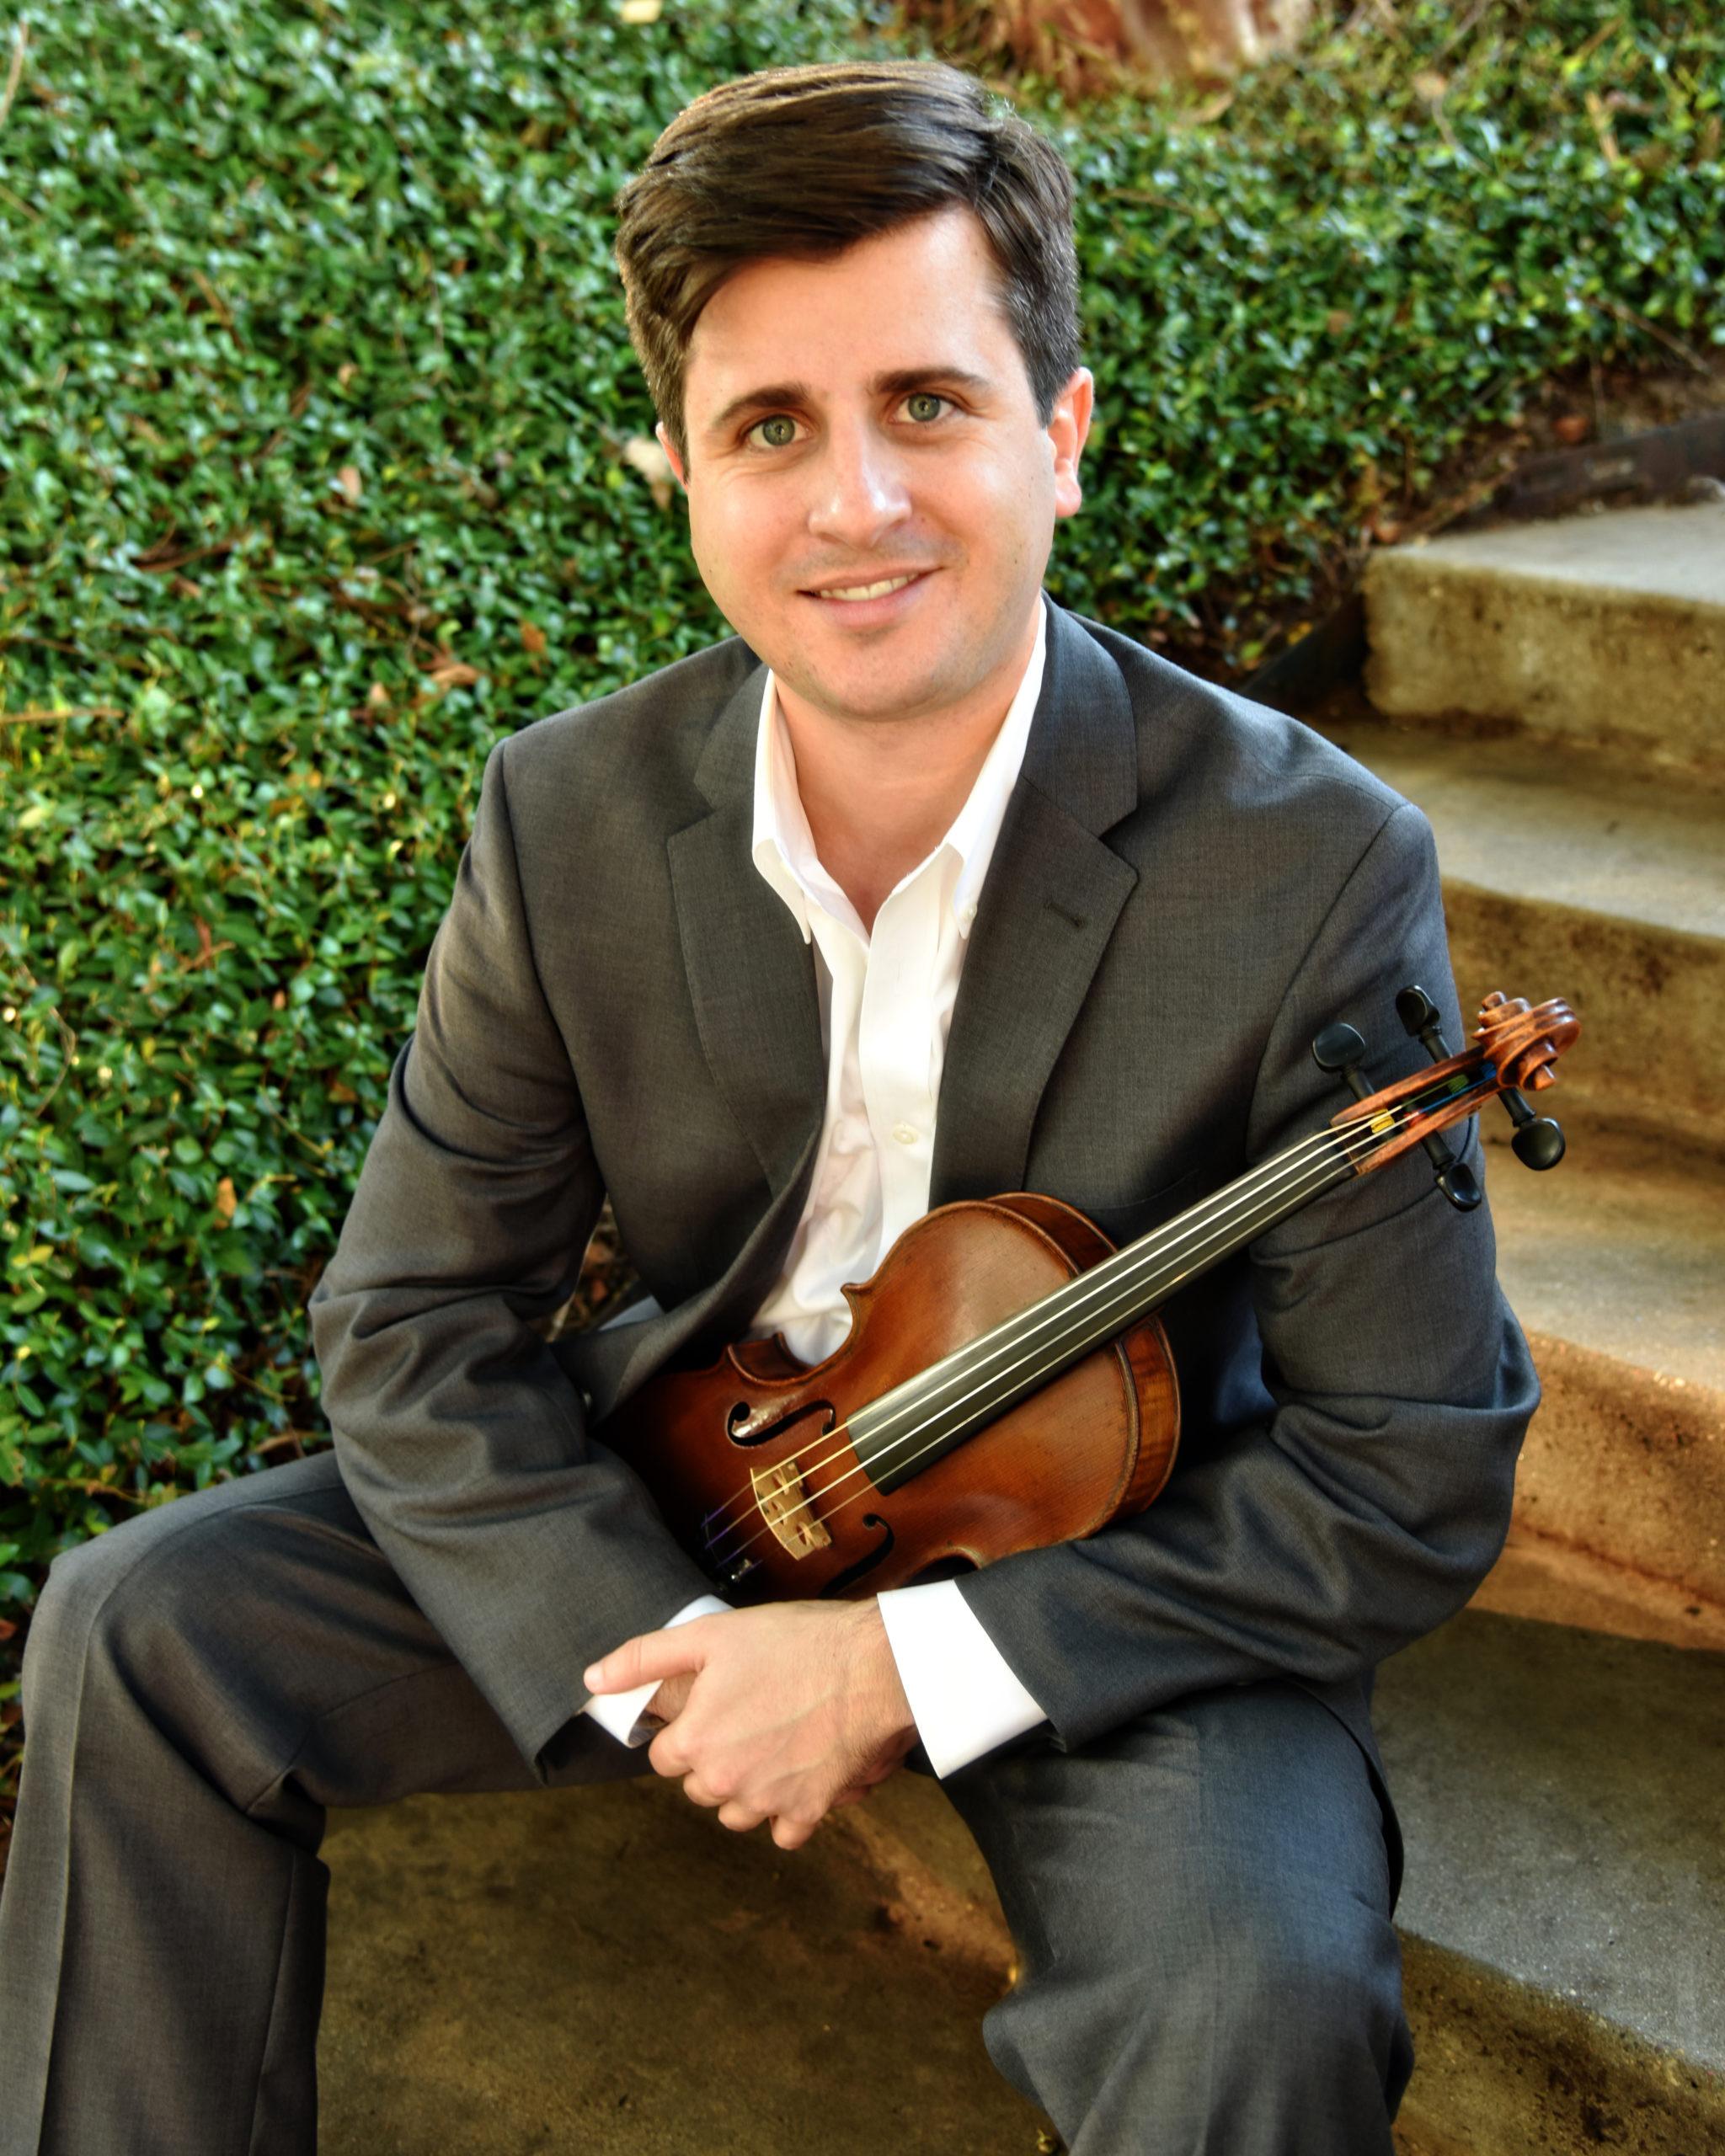 ROCO Violinist, Ben Grube